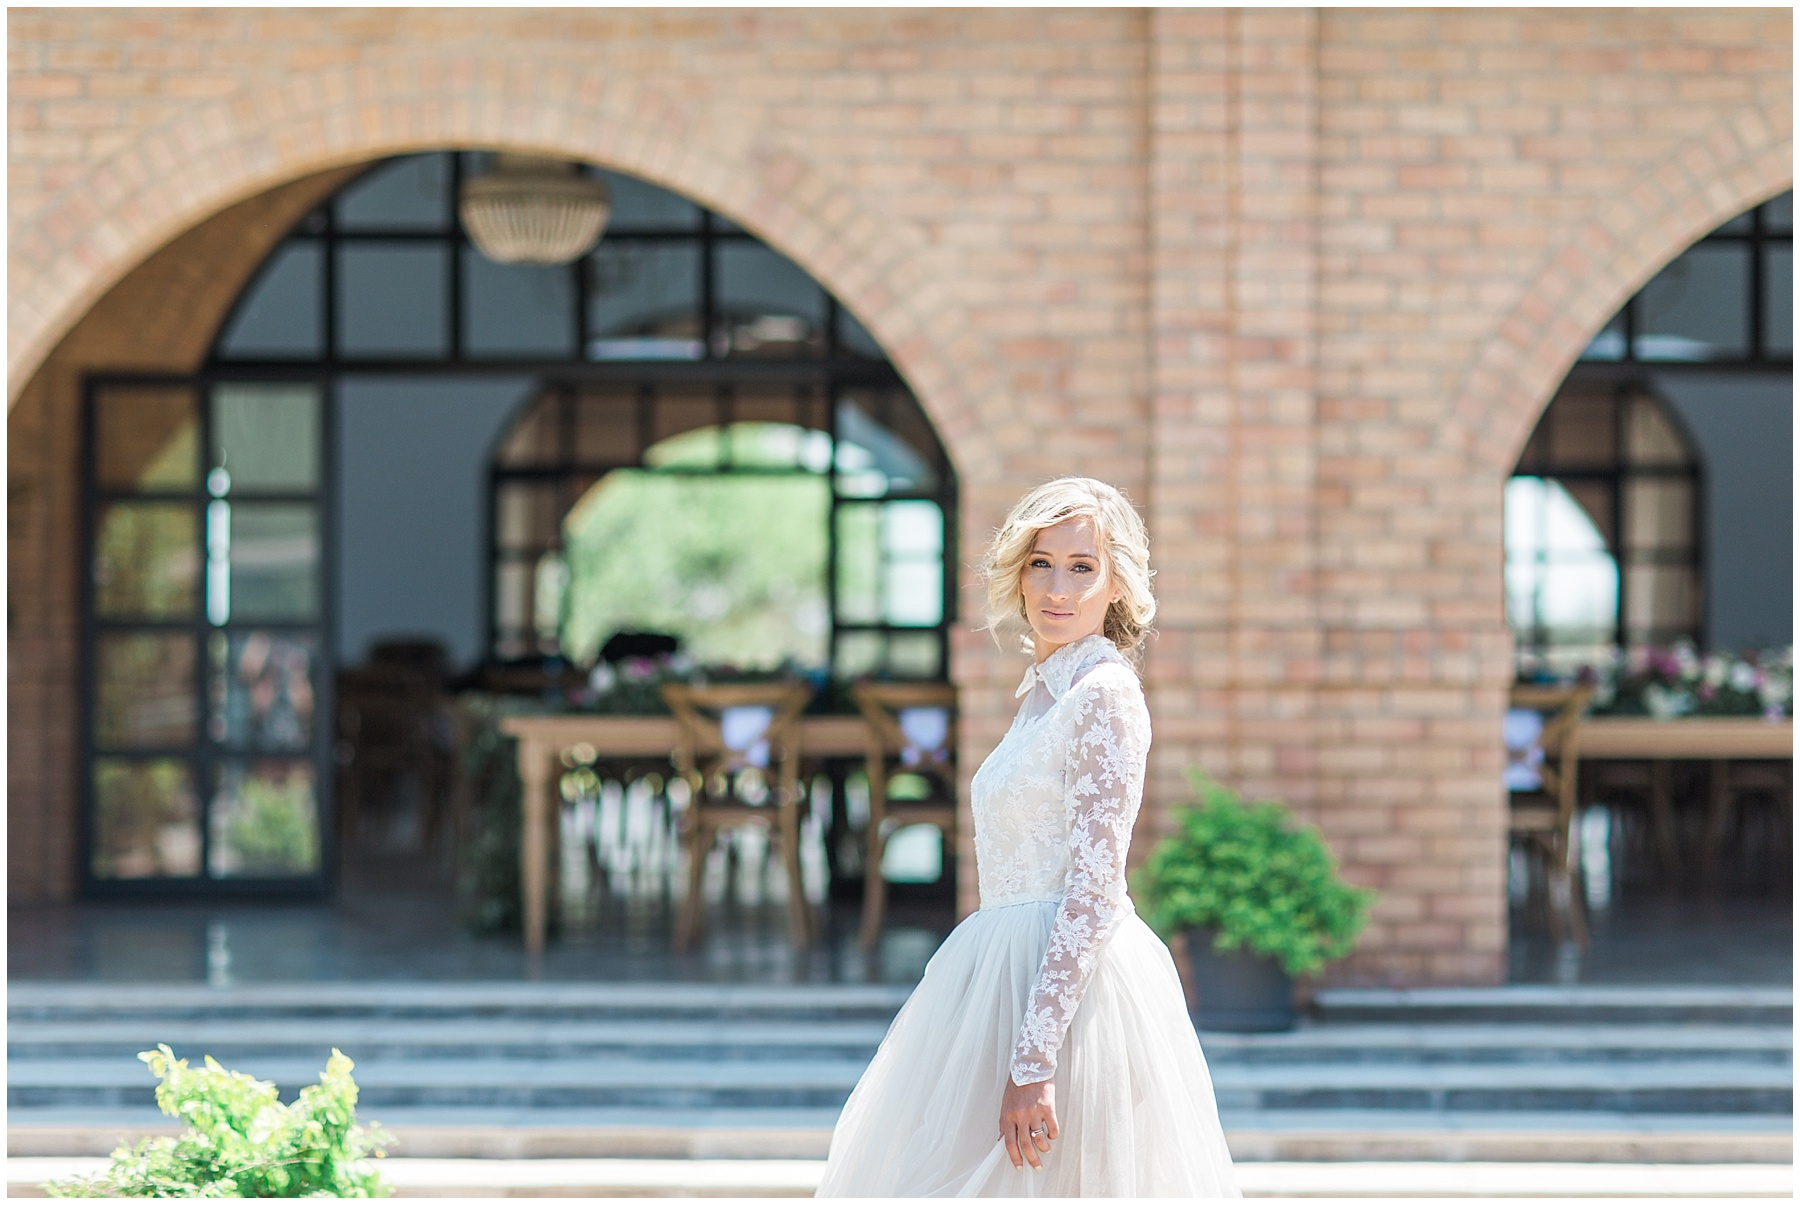 AliciaLandman_JoleneandZander_Wedding_The Pretty Blog_0442.jpg